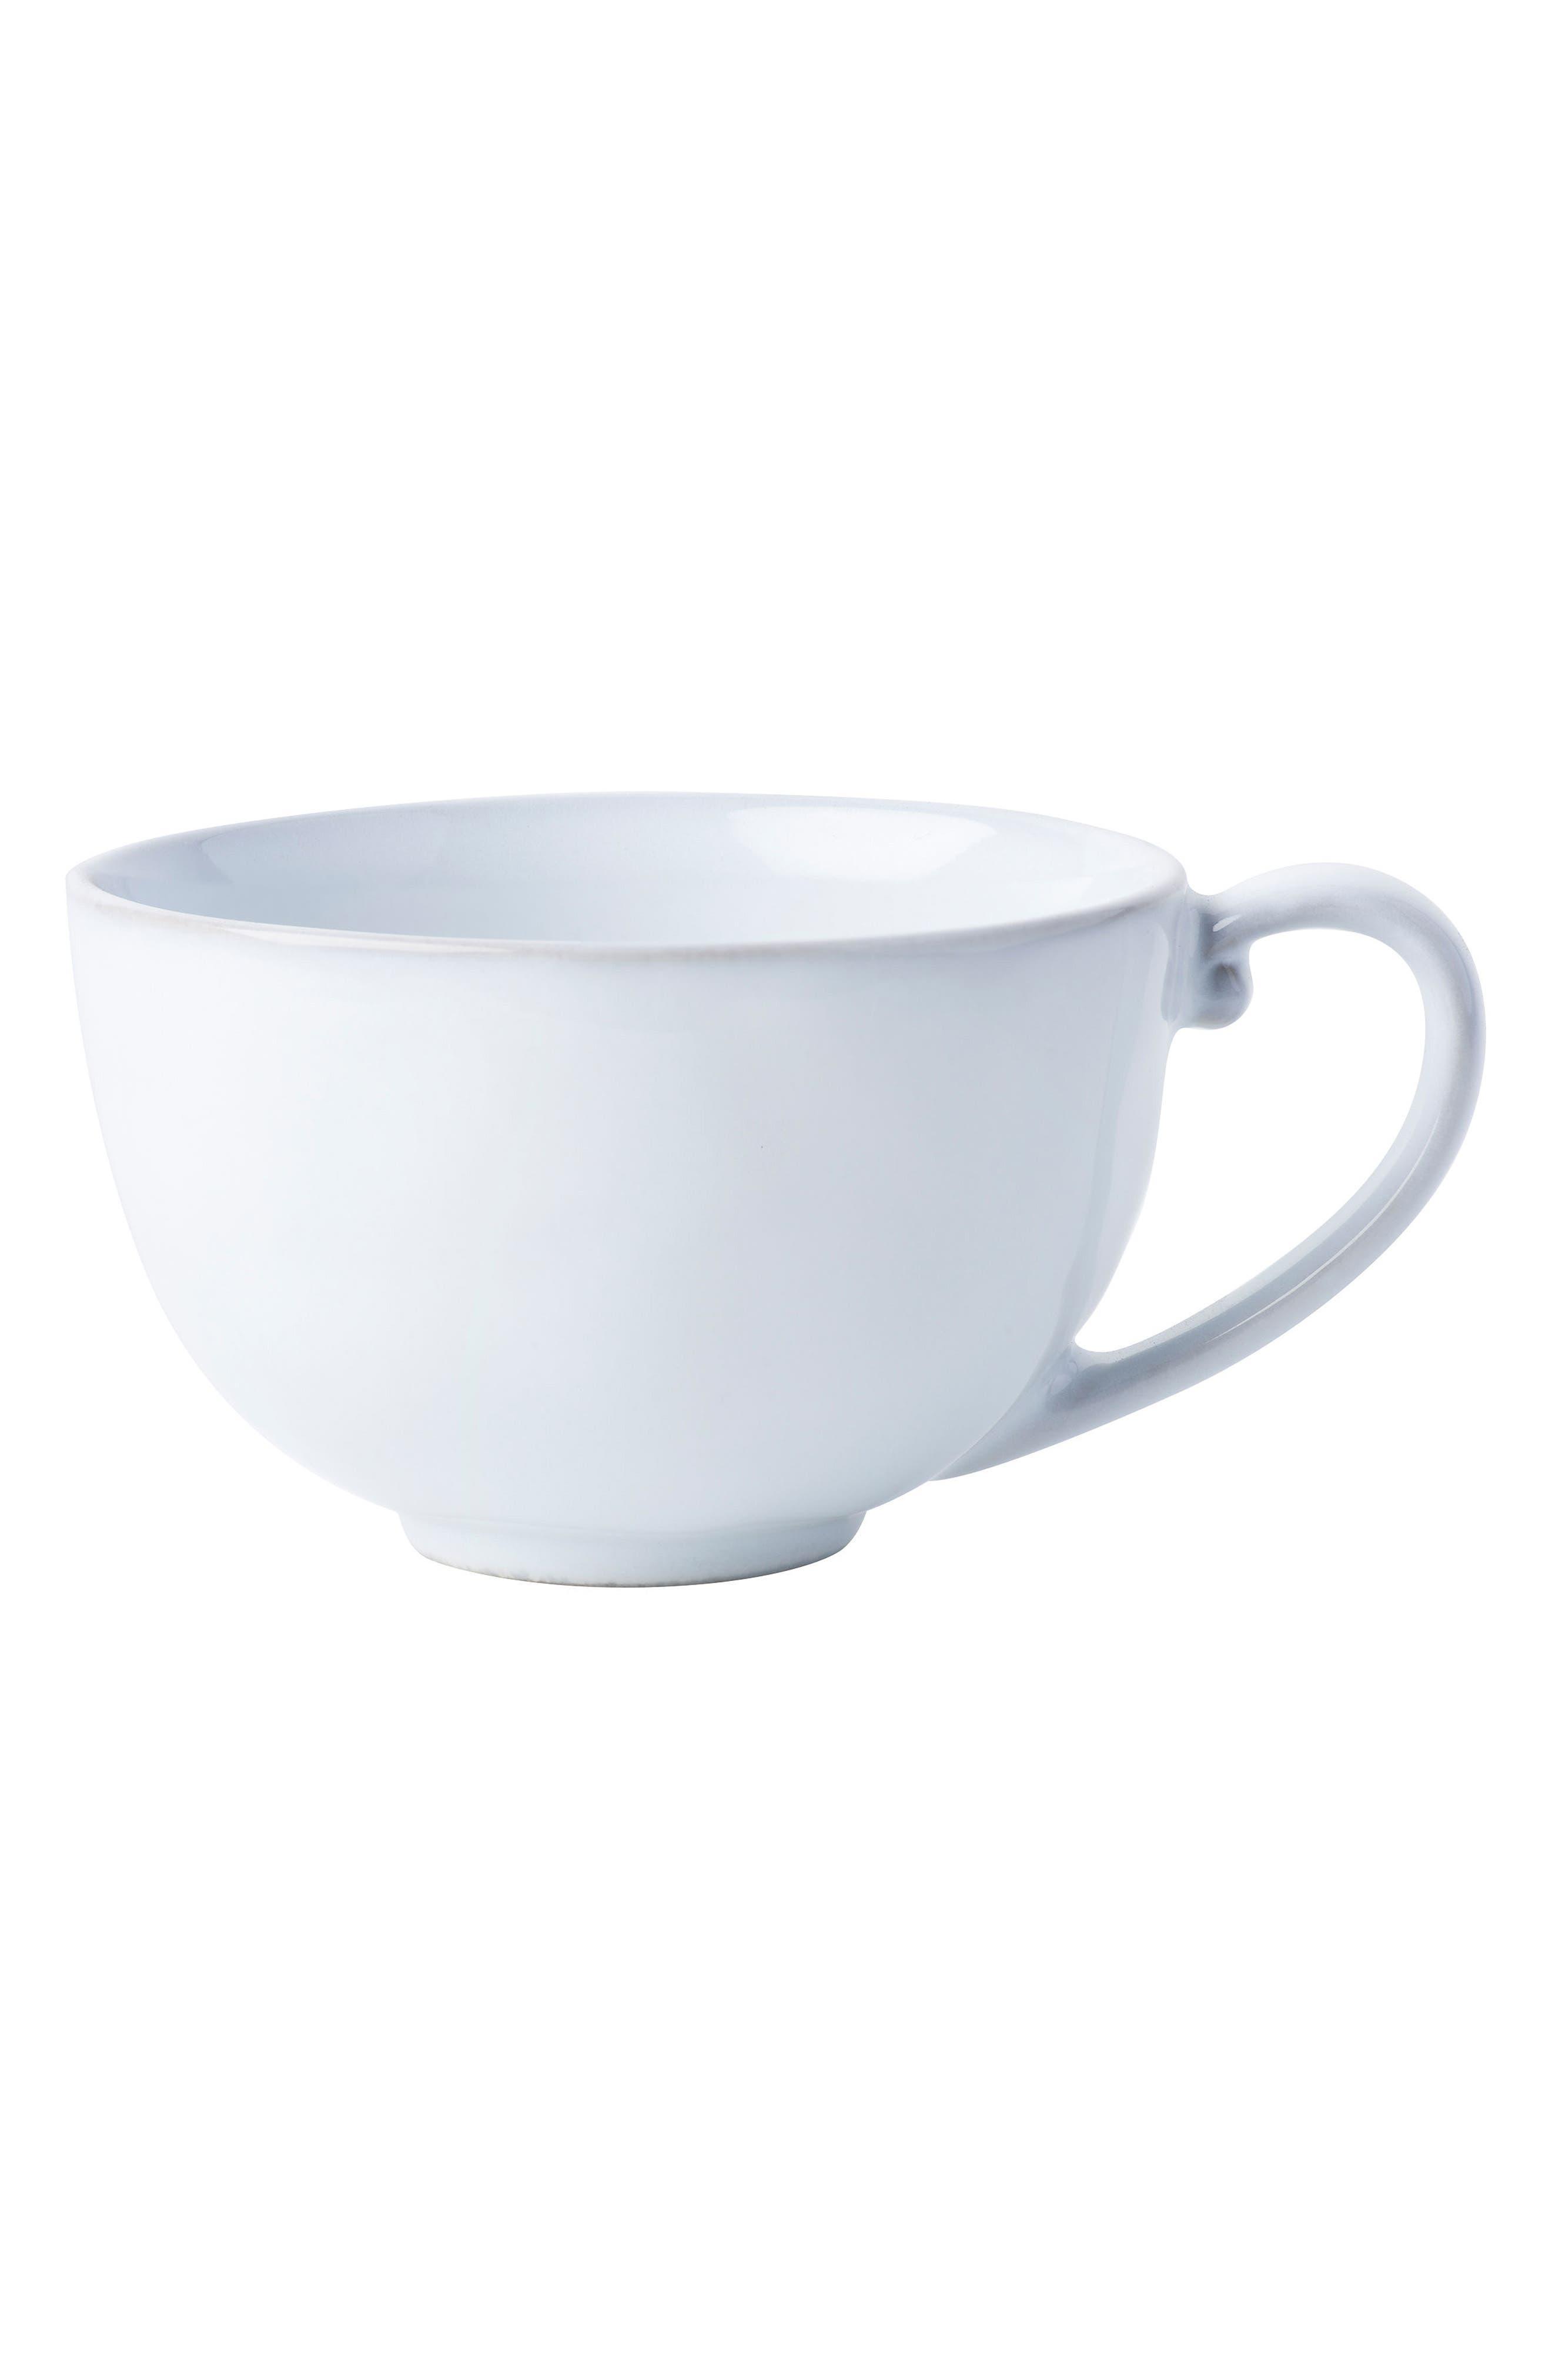 Quotidien White Truffle Ceramic Coffee Cup,                         Main,                         color, White Truffle